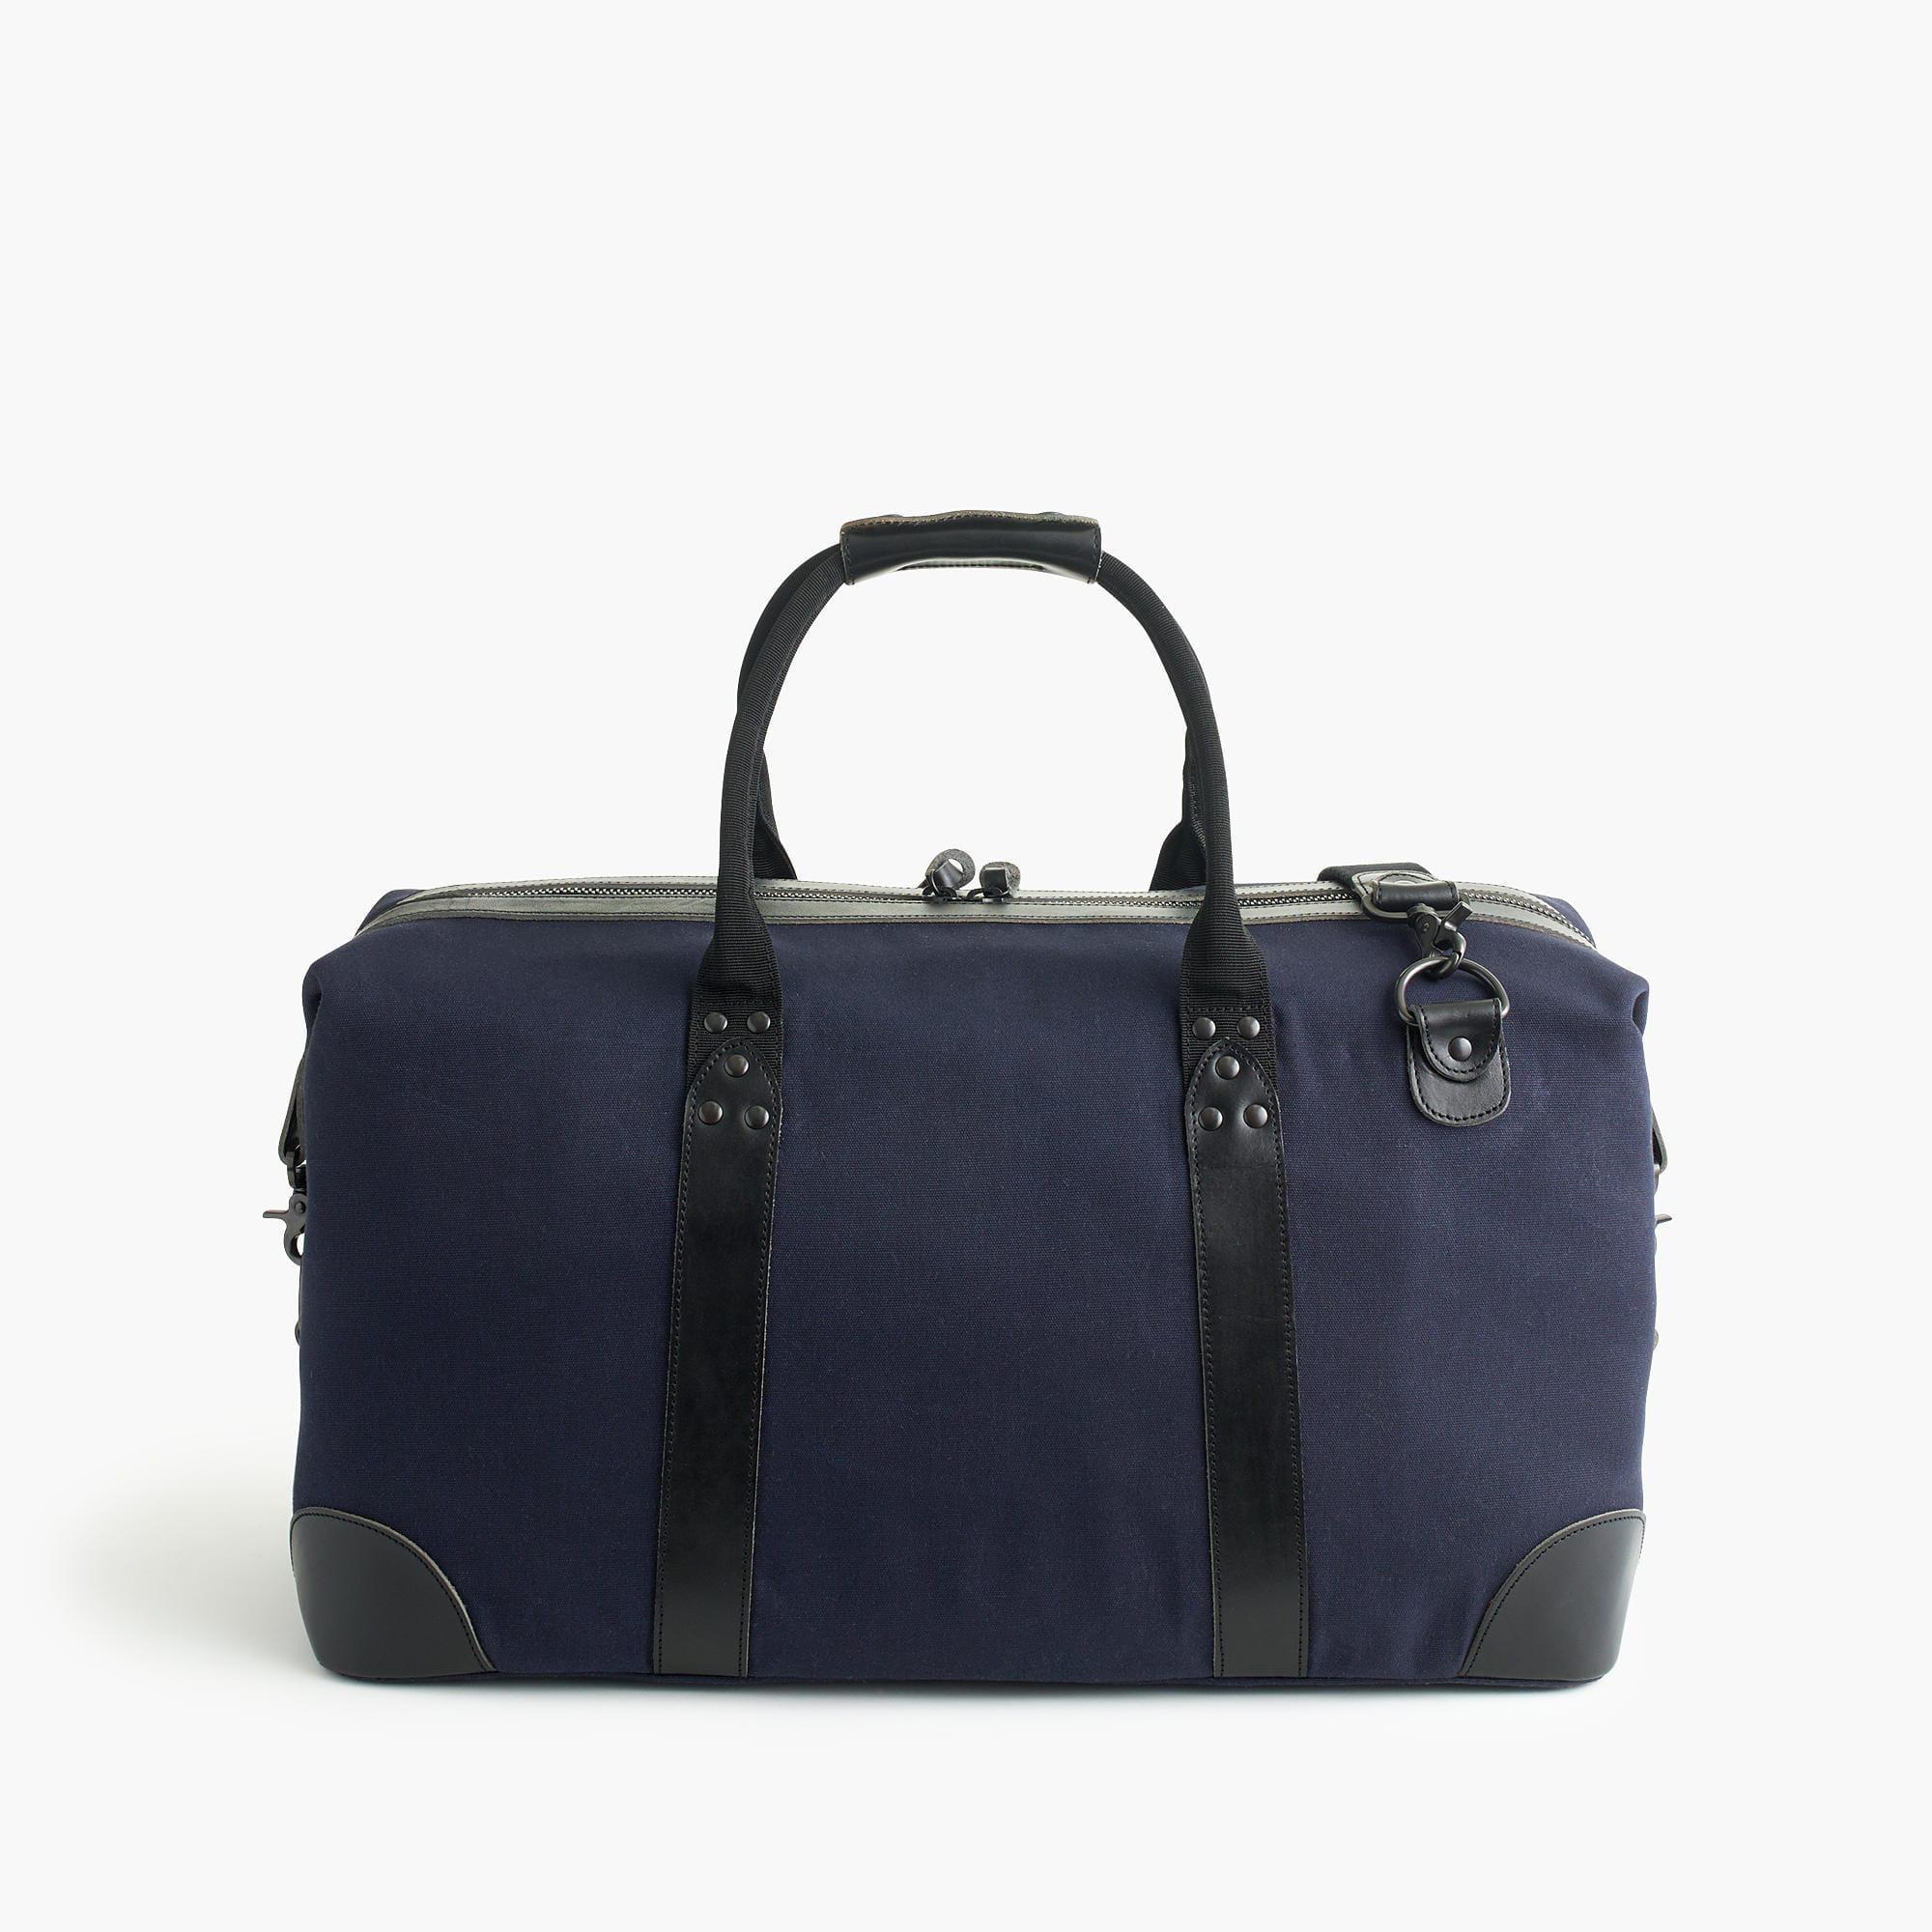 84a8059e79 Lyst - J.Crew Ludlow Weekender Bag in Blue for Men